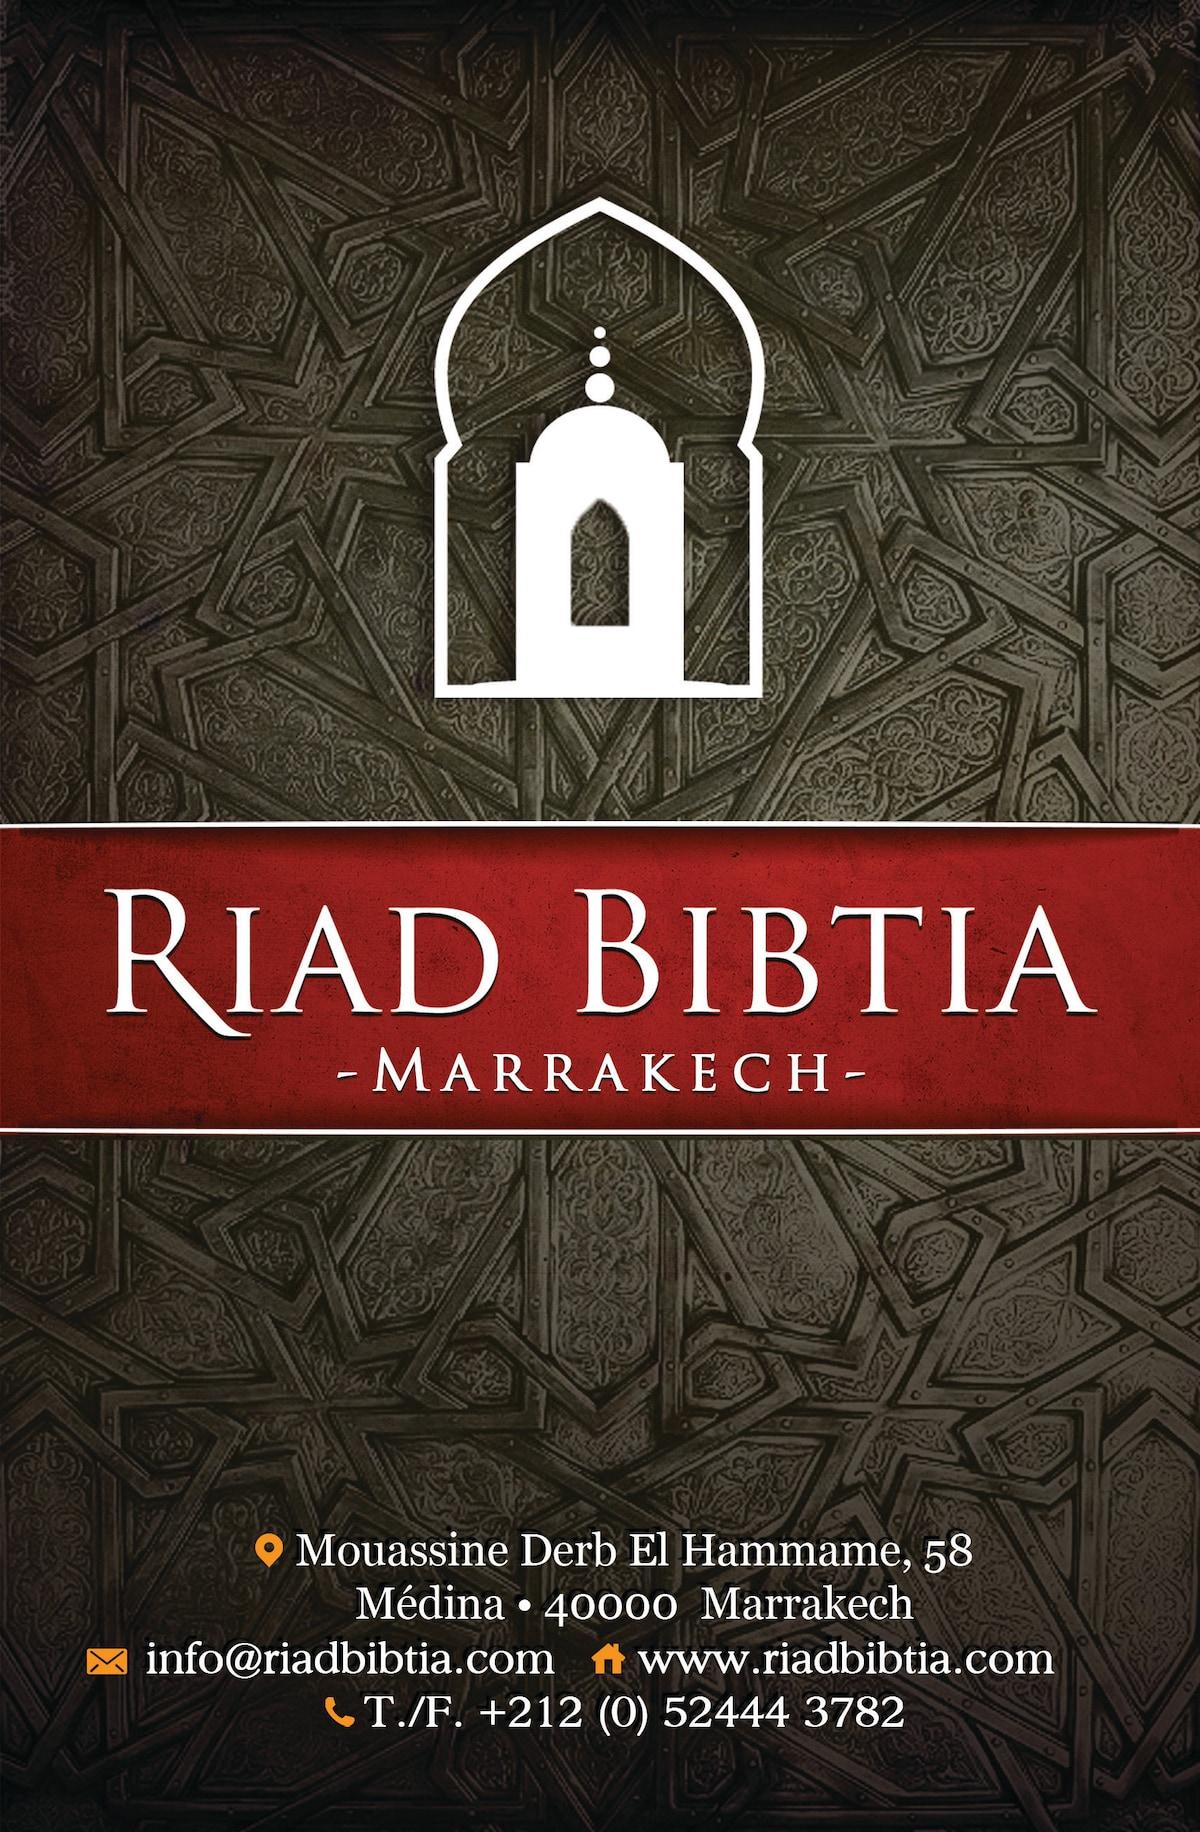 Riad Bibtia From Marrakesh, Morocco